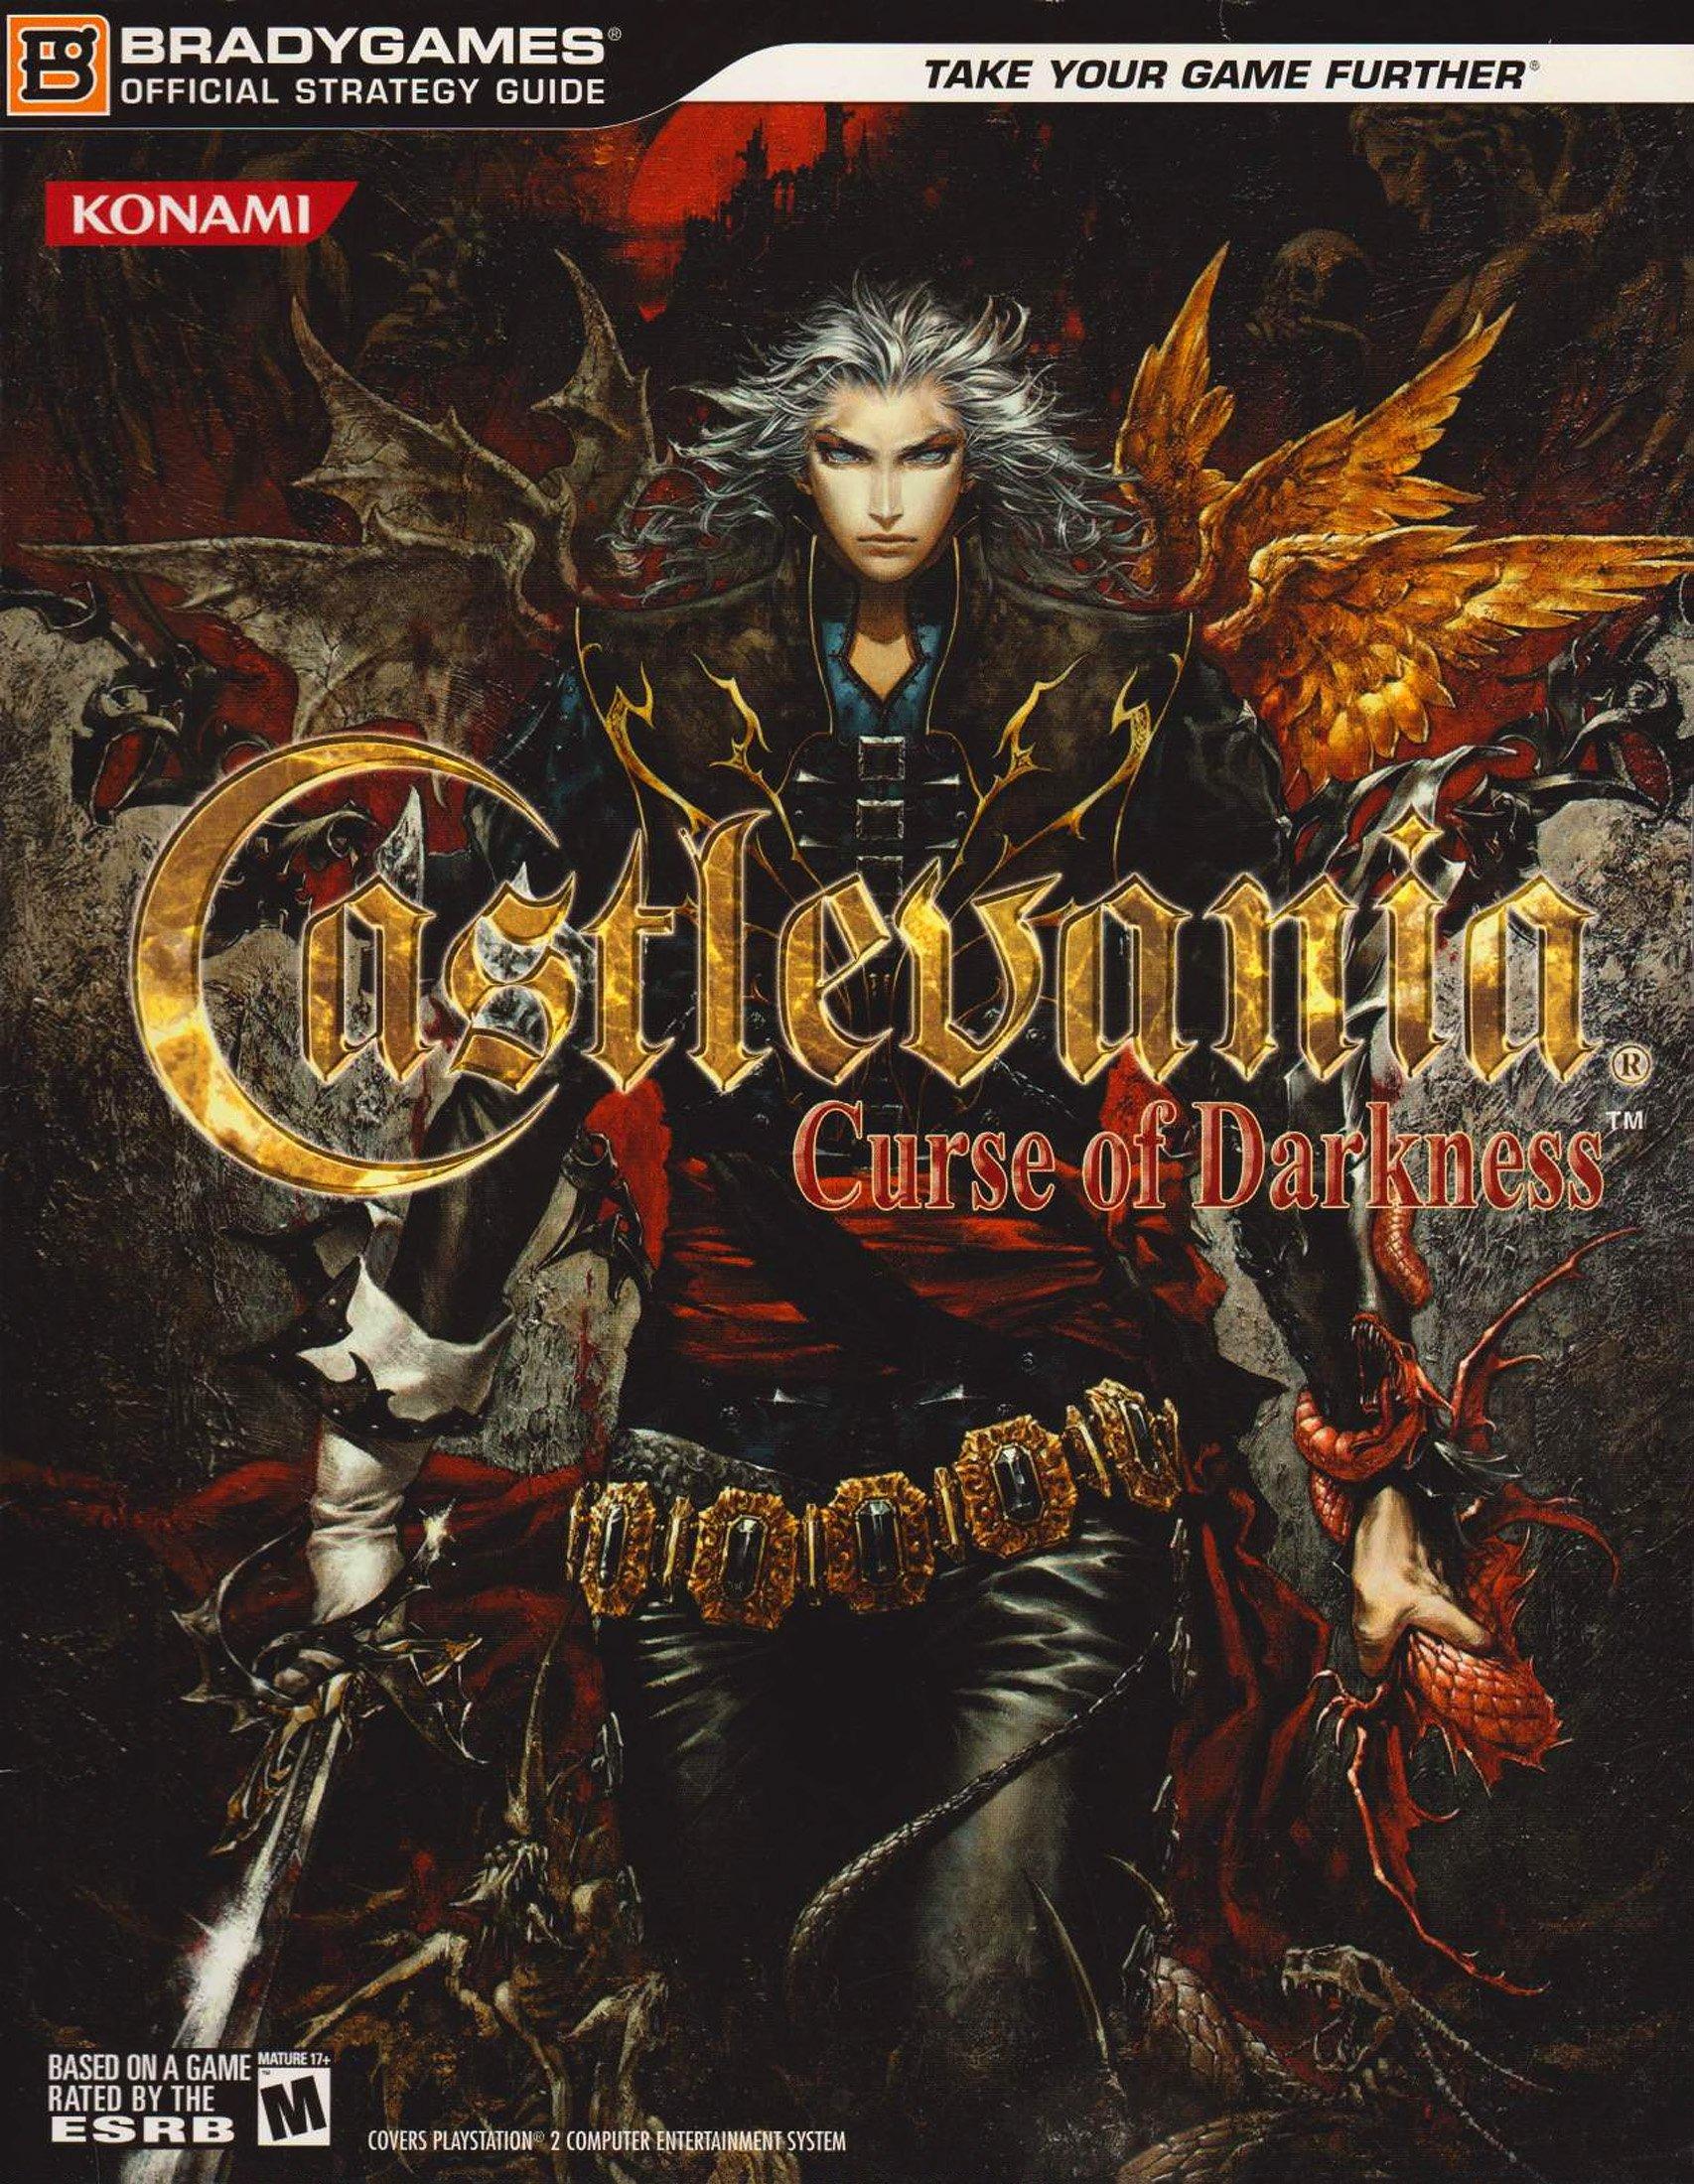 Castlevania - Curse of Darkness